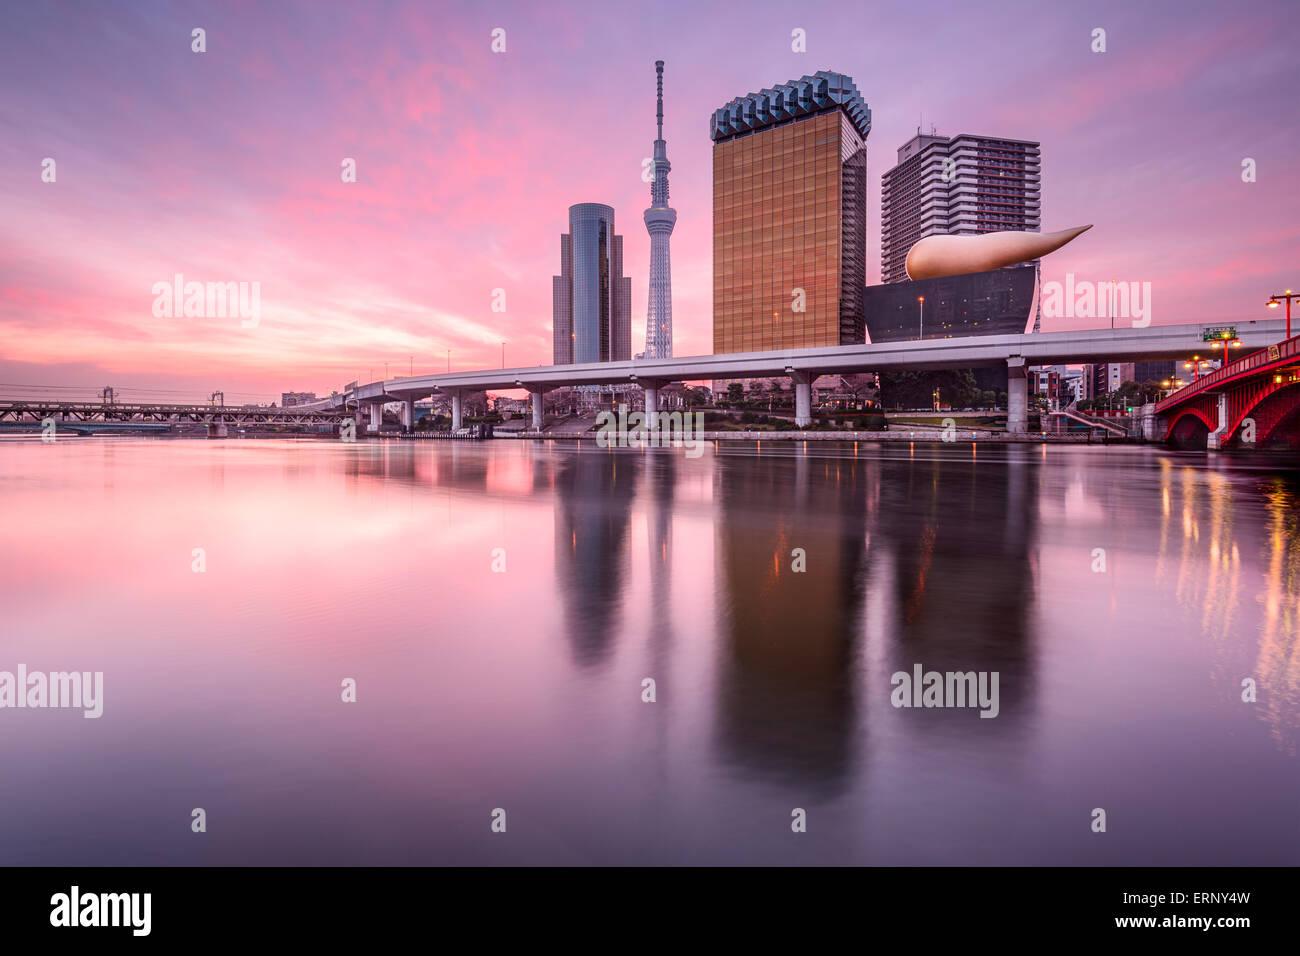 Tokyo, Japan skyline on the Sumida River at dawn. - Stock Image